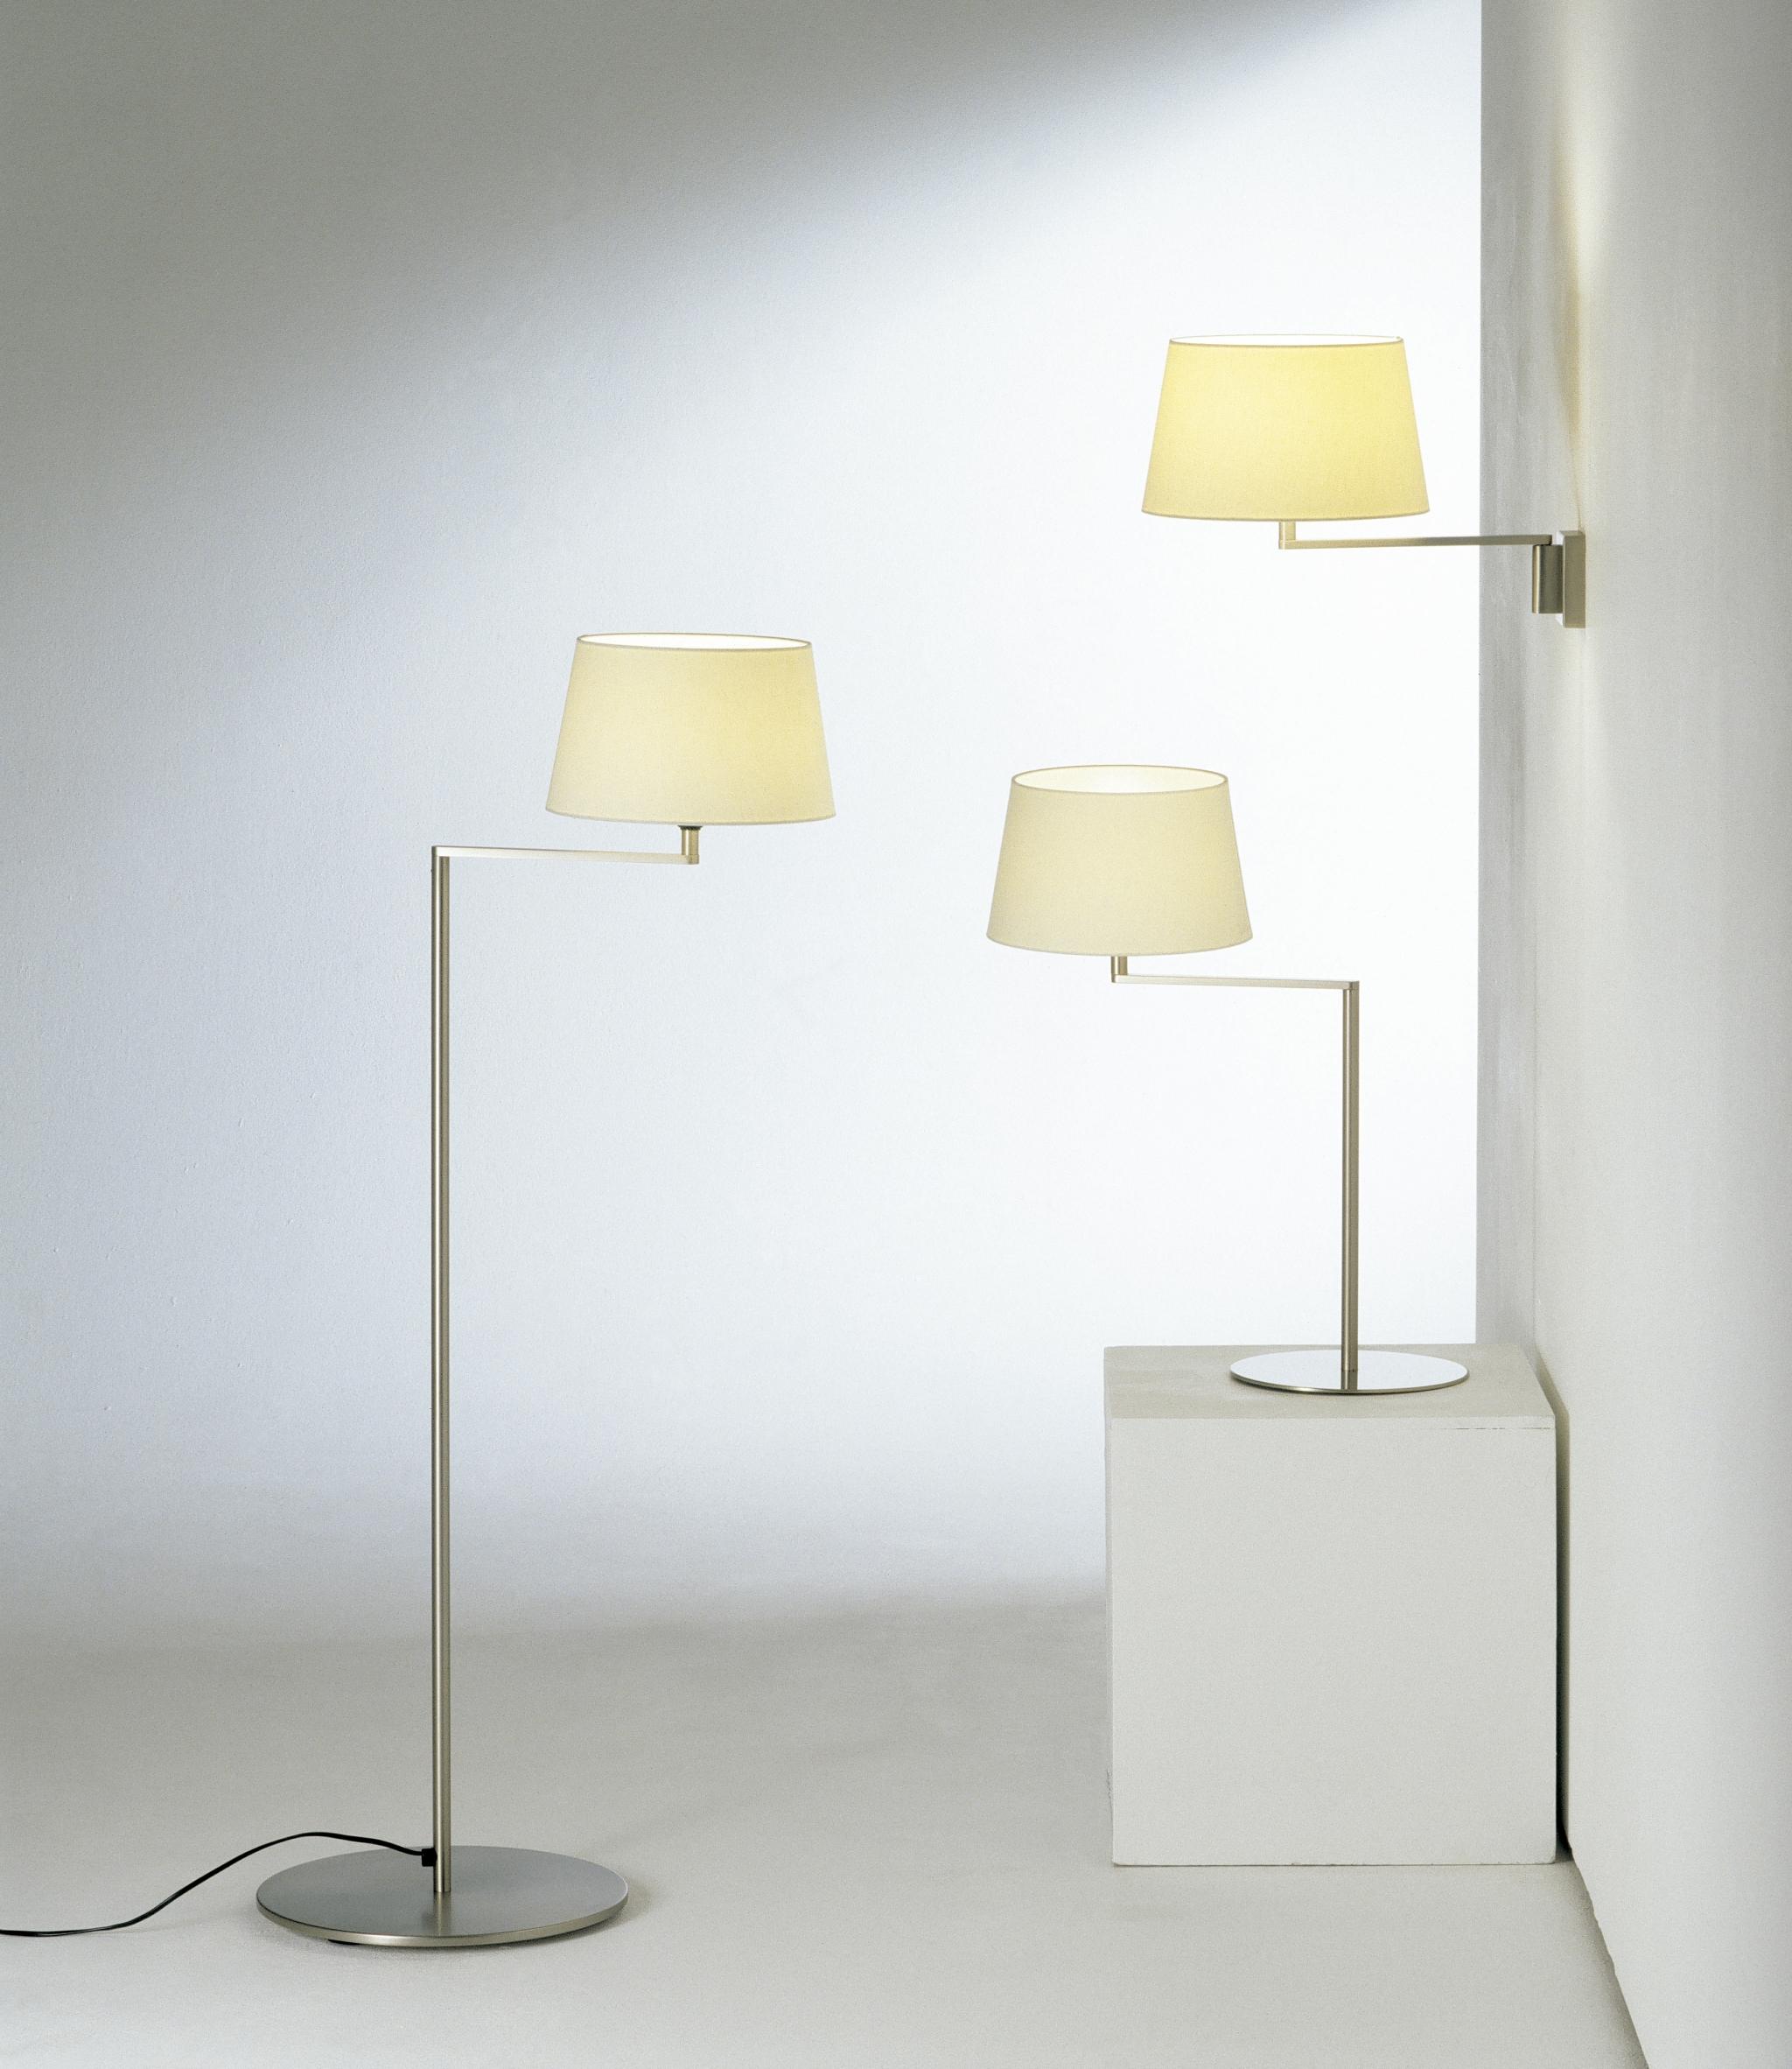 lamp philips kidsplace pendant light distributor kids index online